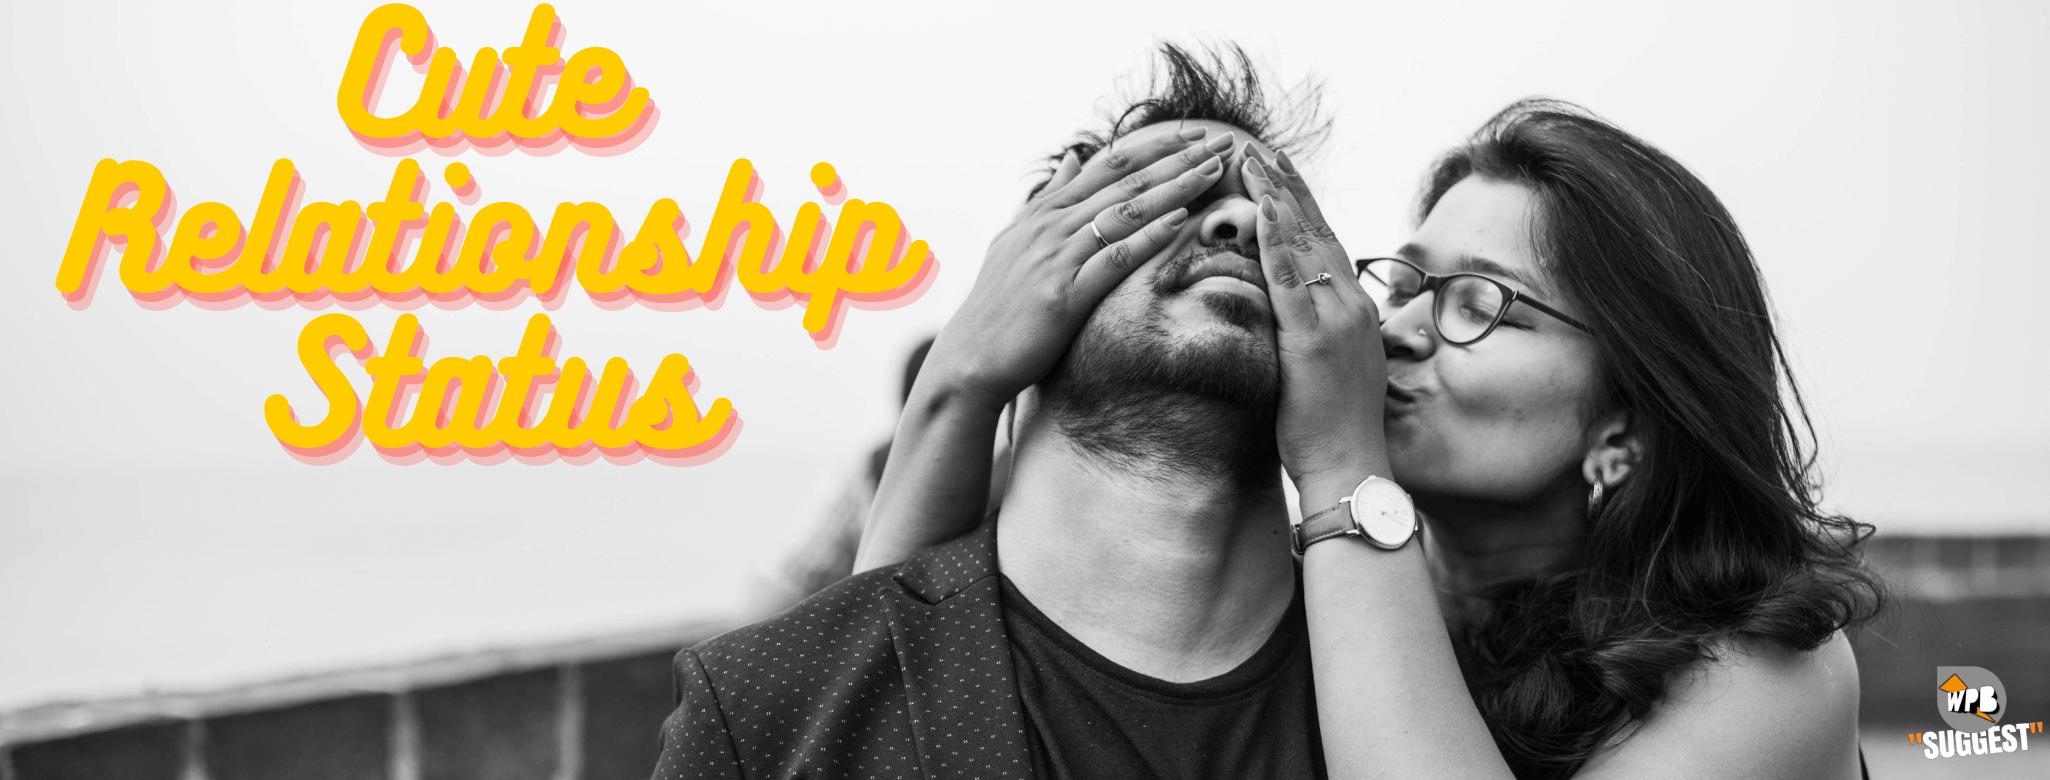 Cute Relationship Status